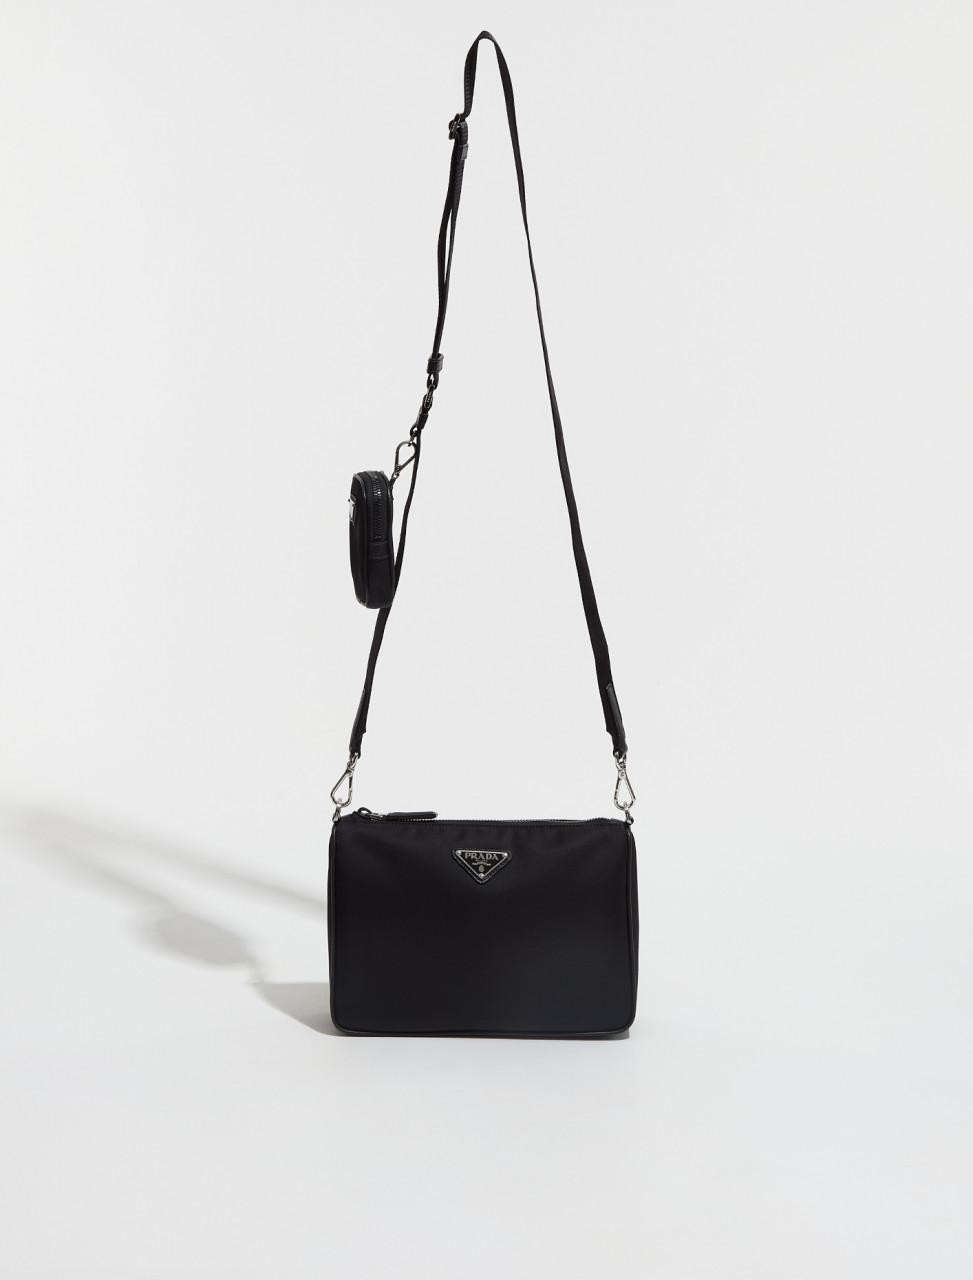 2VH113_2DMH_F0002 PRADA NYLON AND SAFFIANO LEATHER SHOULDER BAG IN BLACK